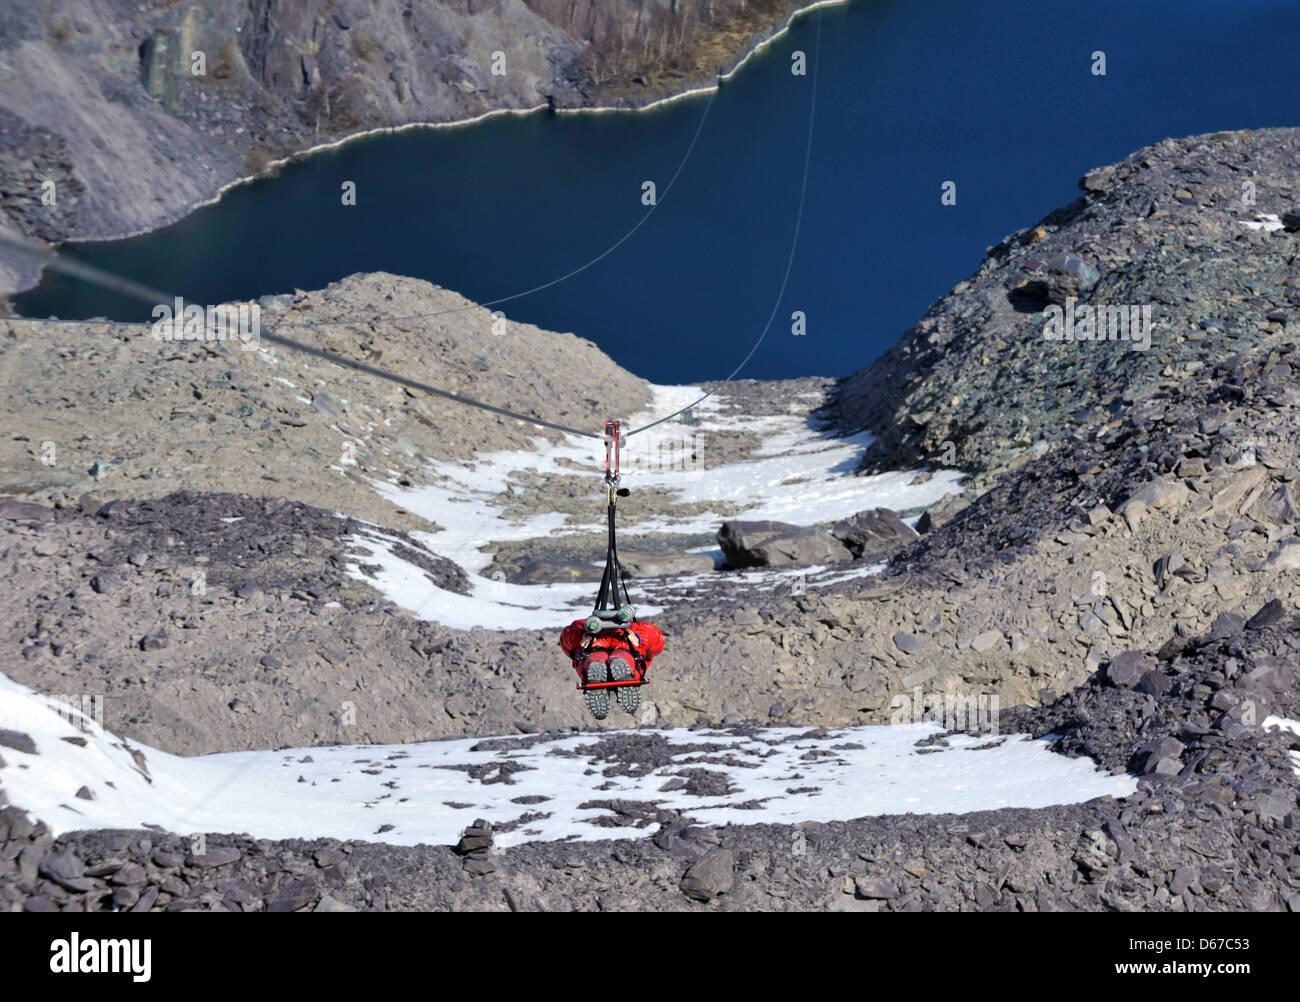 4 man zip wire wales directv deca adapter diagram world stock photos images alamy penrhyn quarry bethesda bangor gwynedd north the fastest